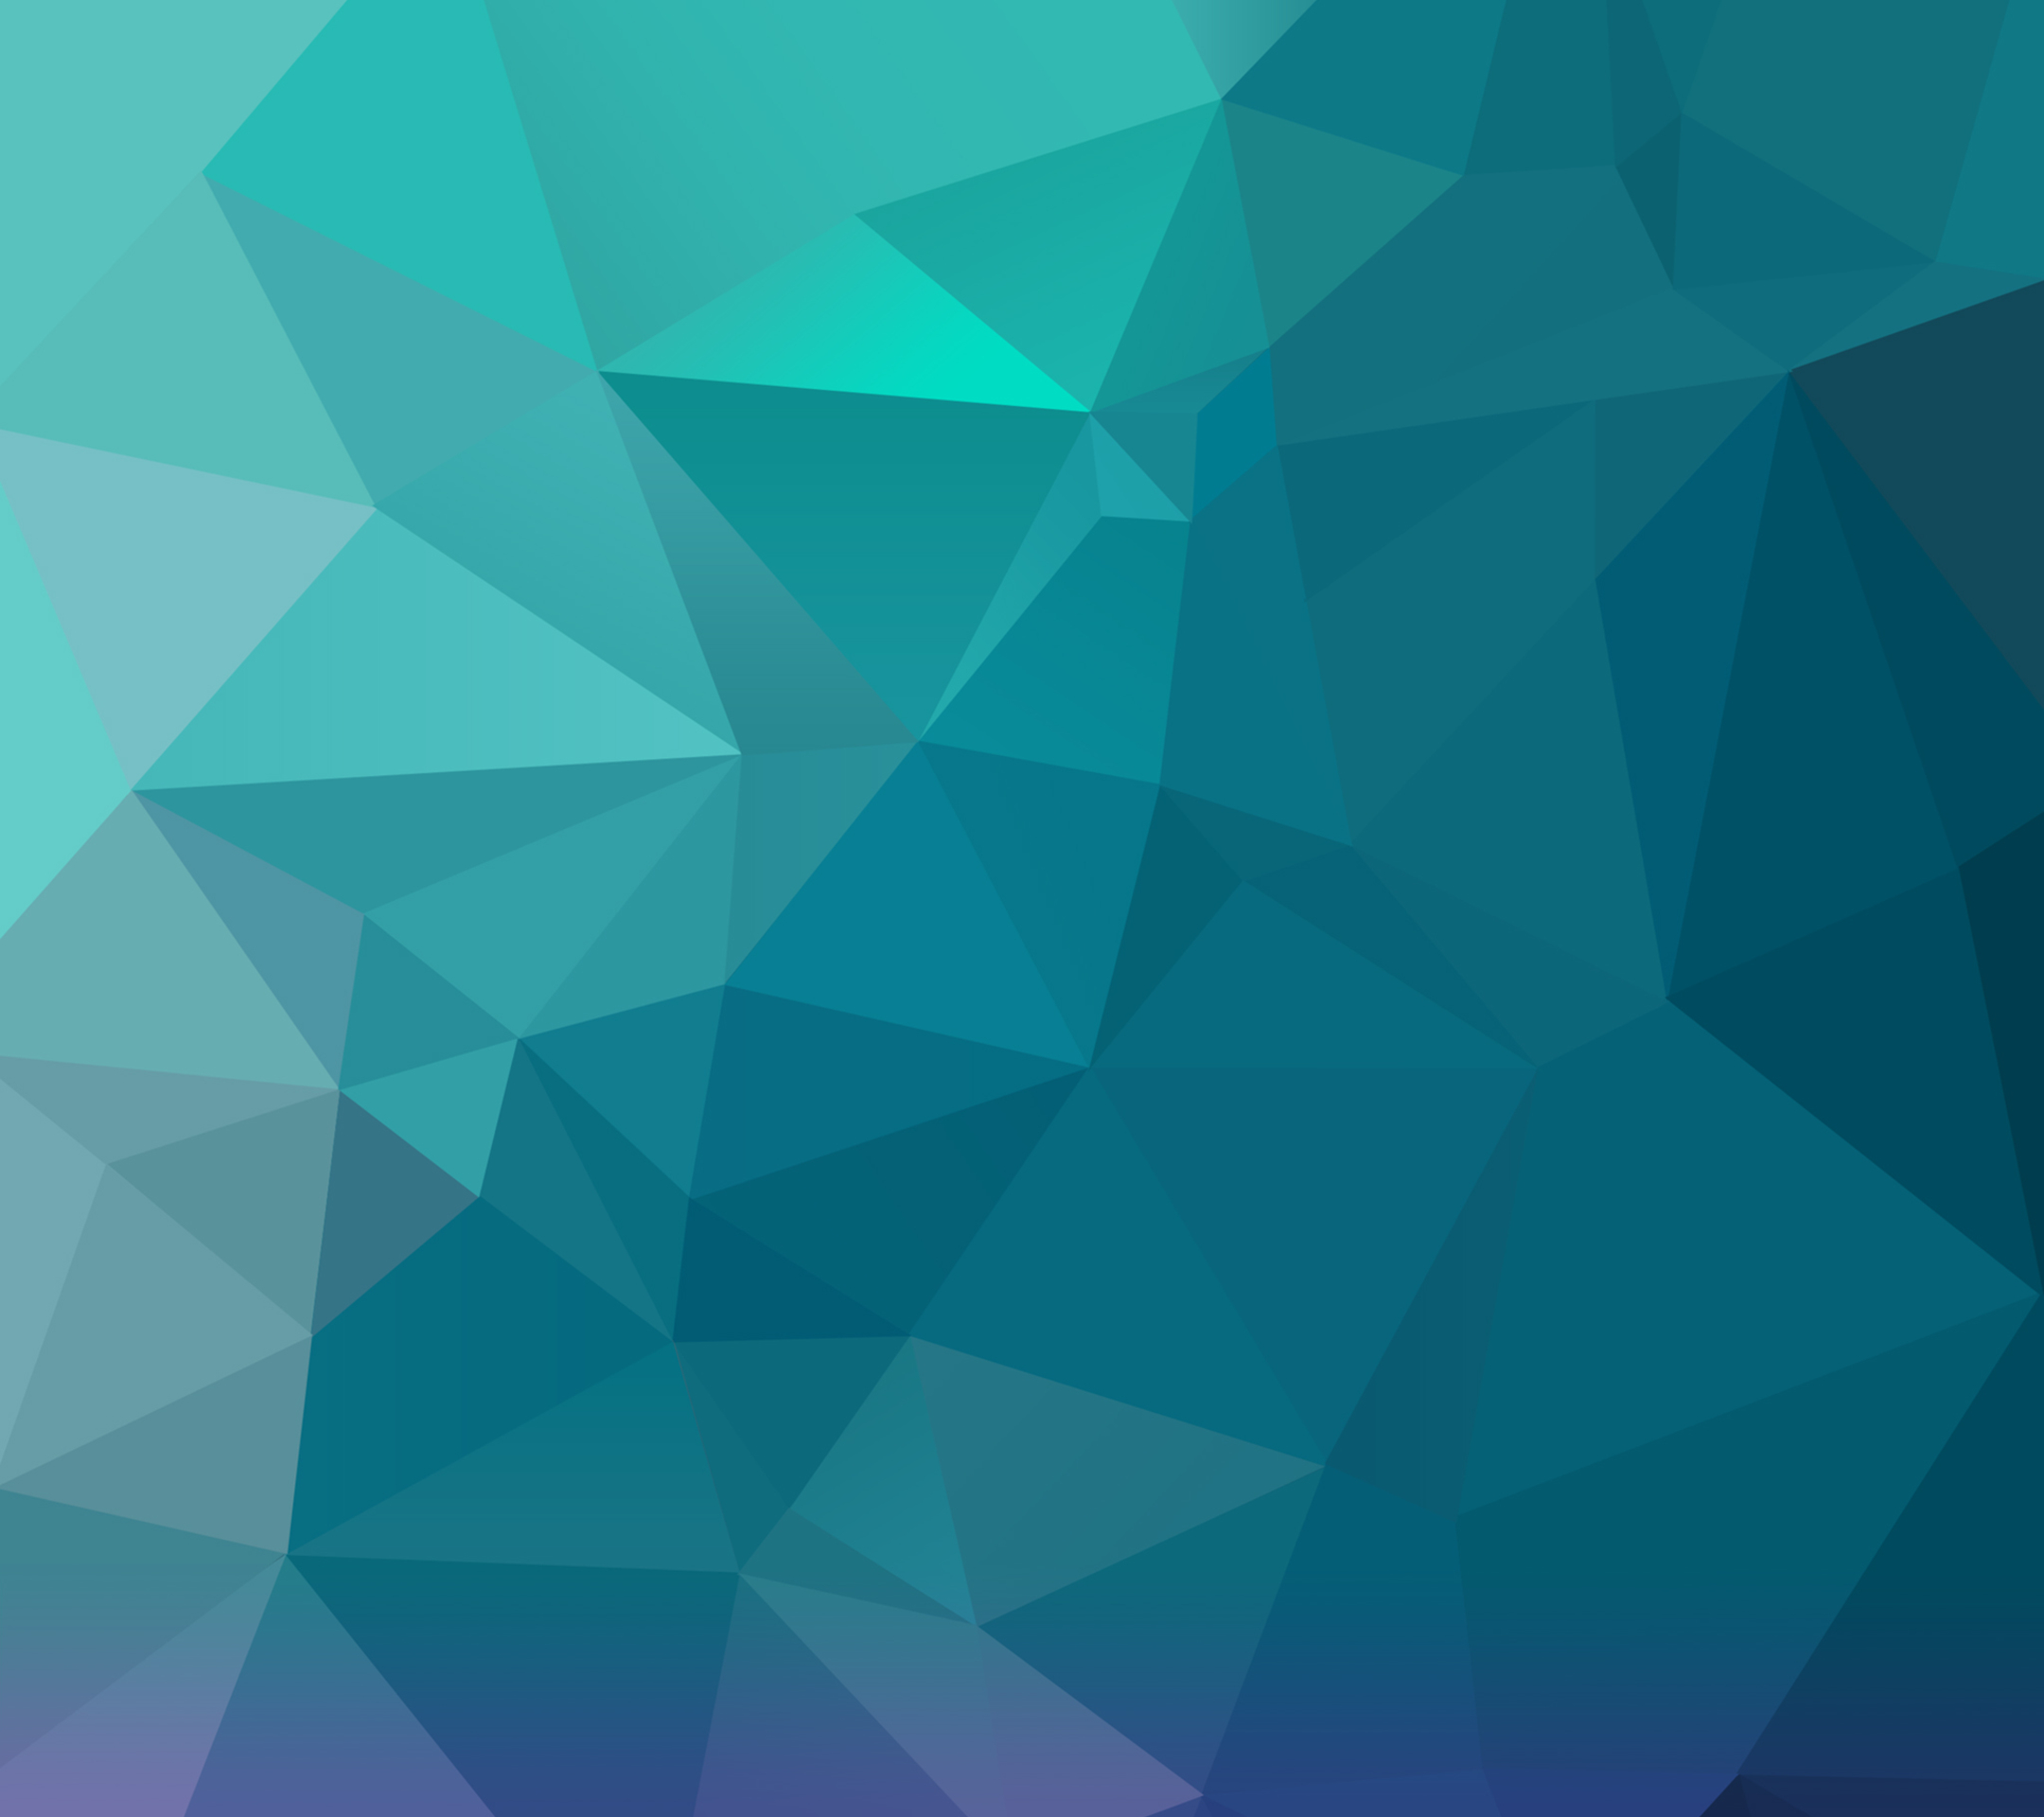 Galaxy S5 HD Wallpaper default vivid colorful 1jpg26gallery name 2160x1920